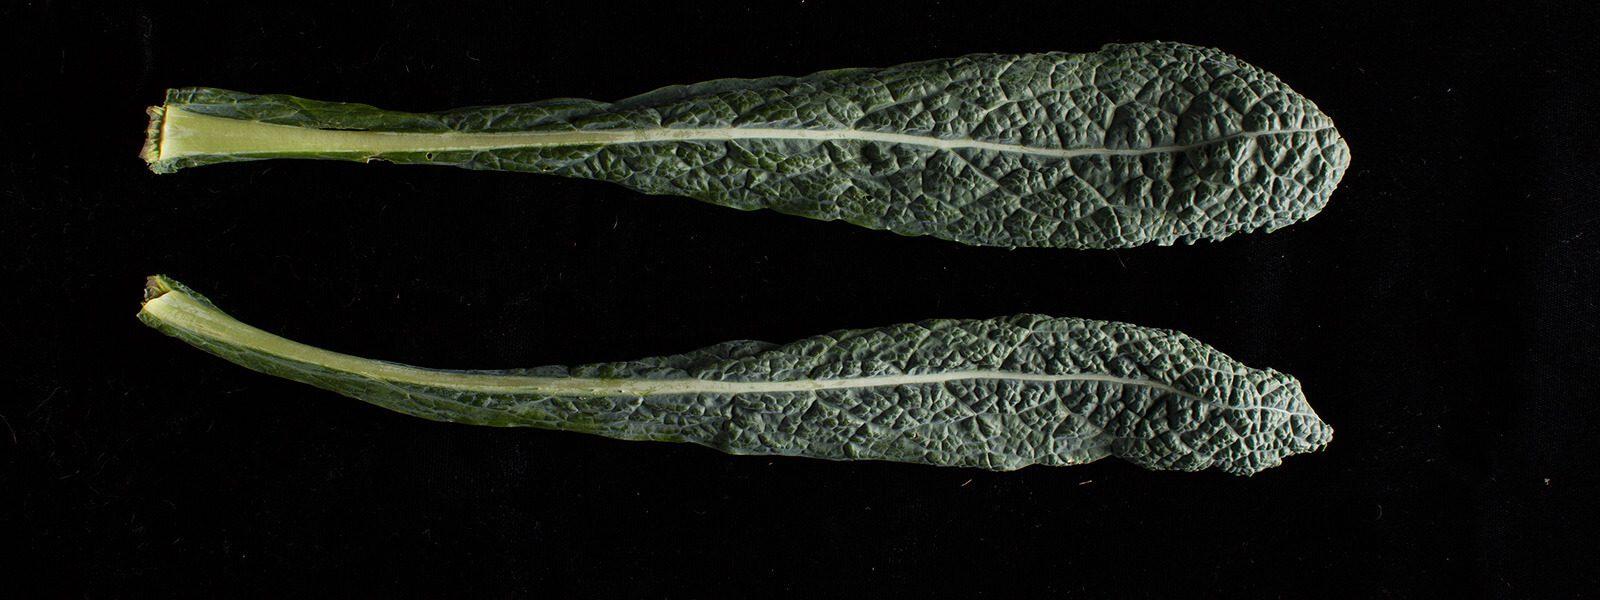 2 lacinato kale leaves.